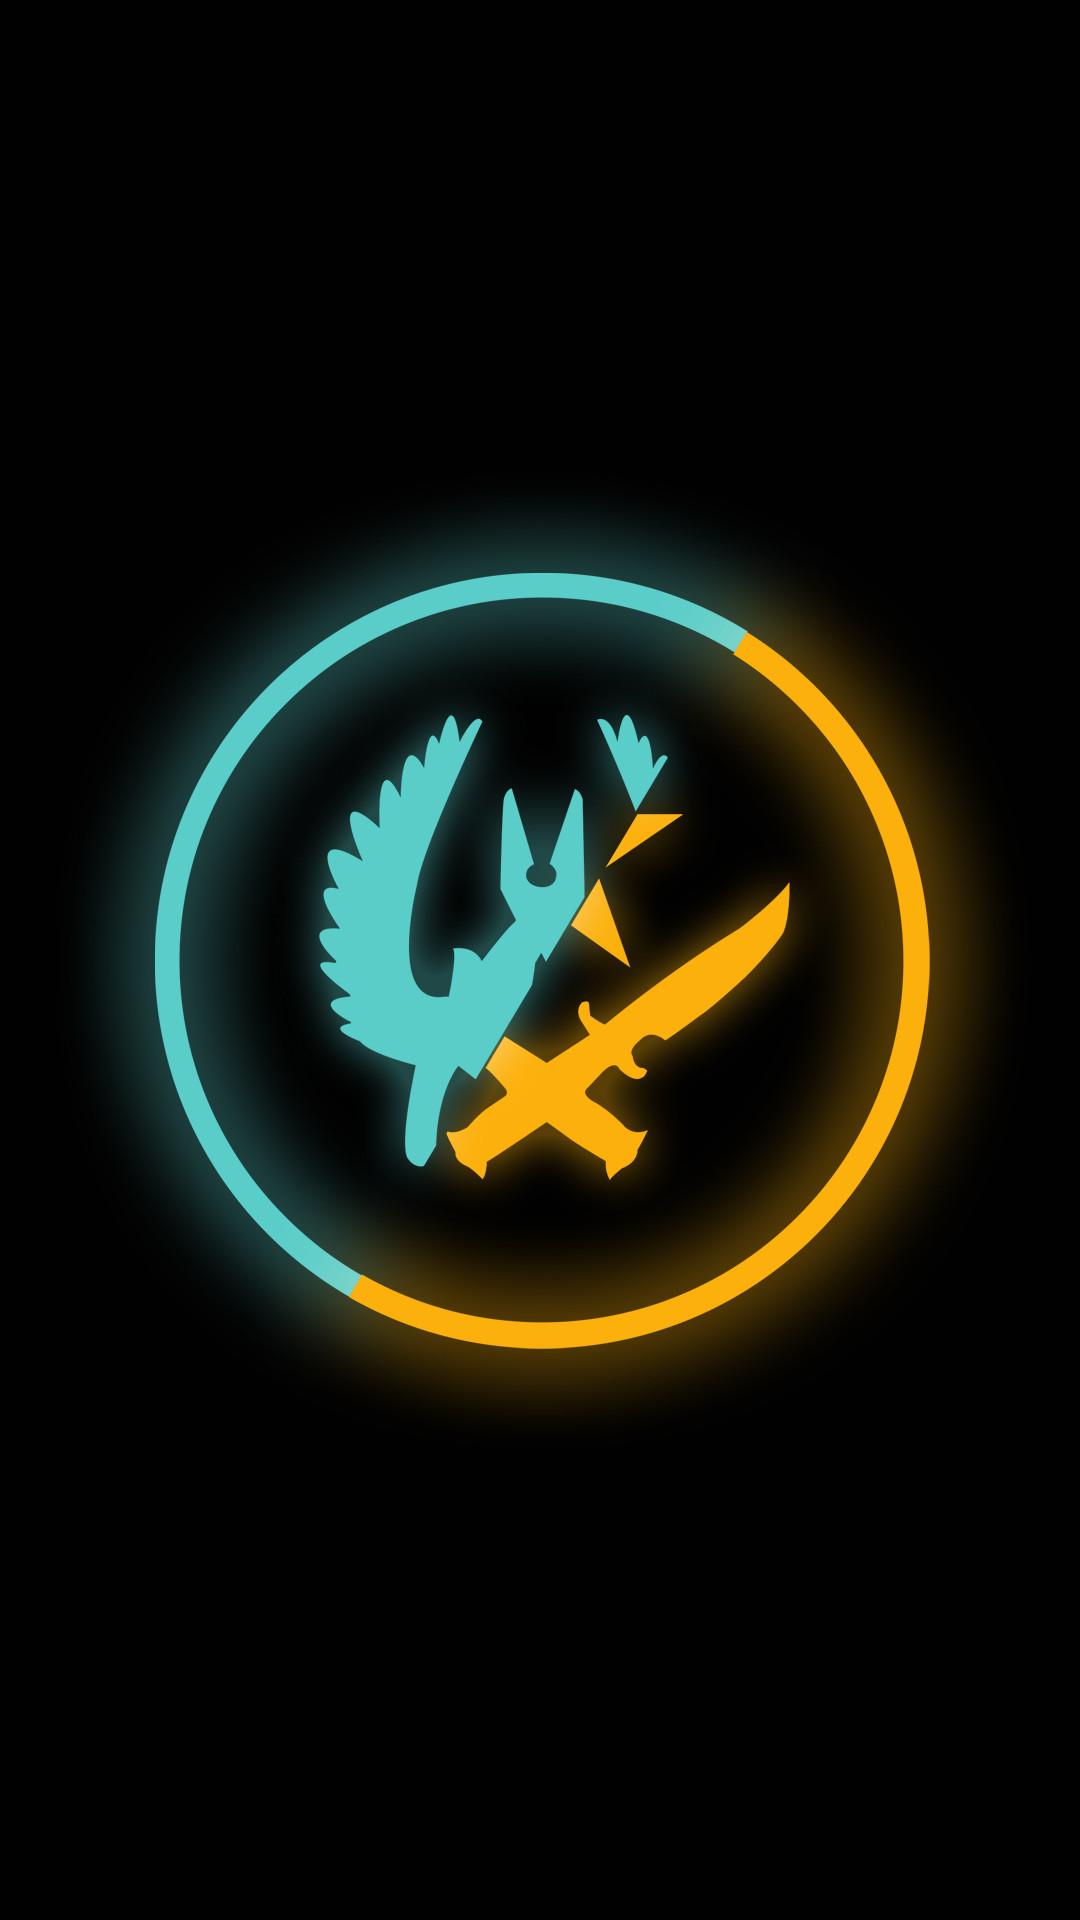 New C9 Logo lol #games #globaloffensive #CSGO #counterstrike #hltv #CS  #steam #Valve #djswat #CS16   Counter-Strike: Global Offensive   Pinterest    Steam …